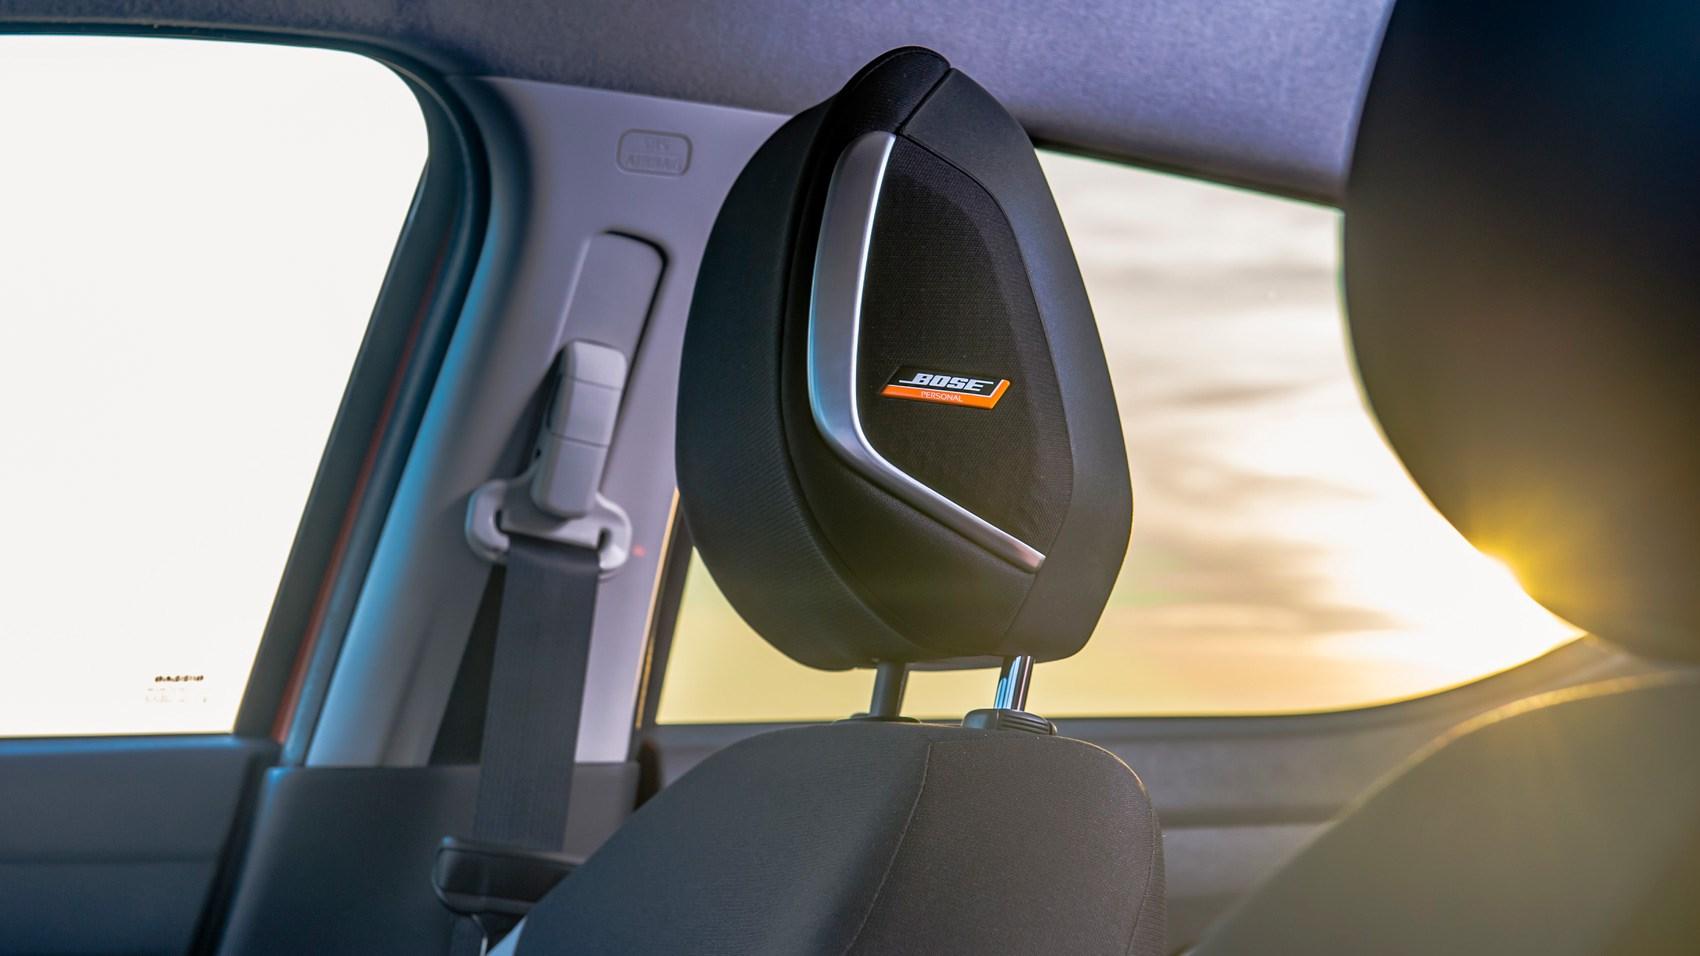 Nissan Micra 2017 diesel Bose headrest speaker